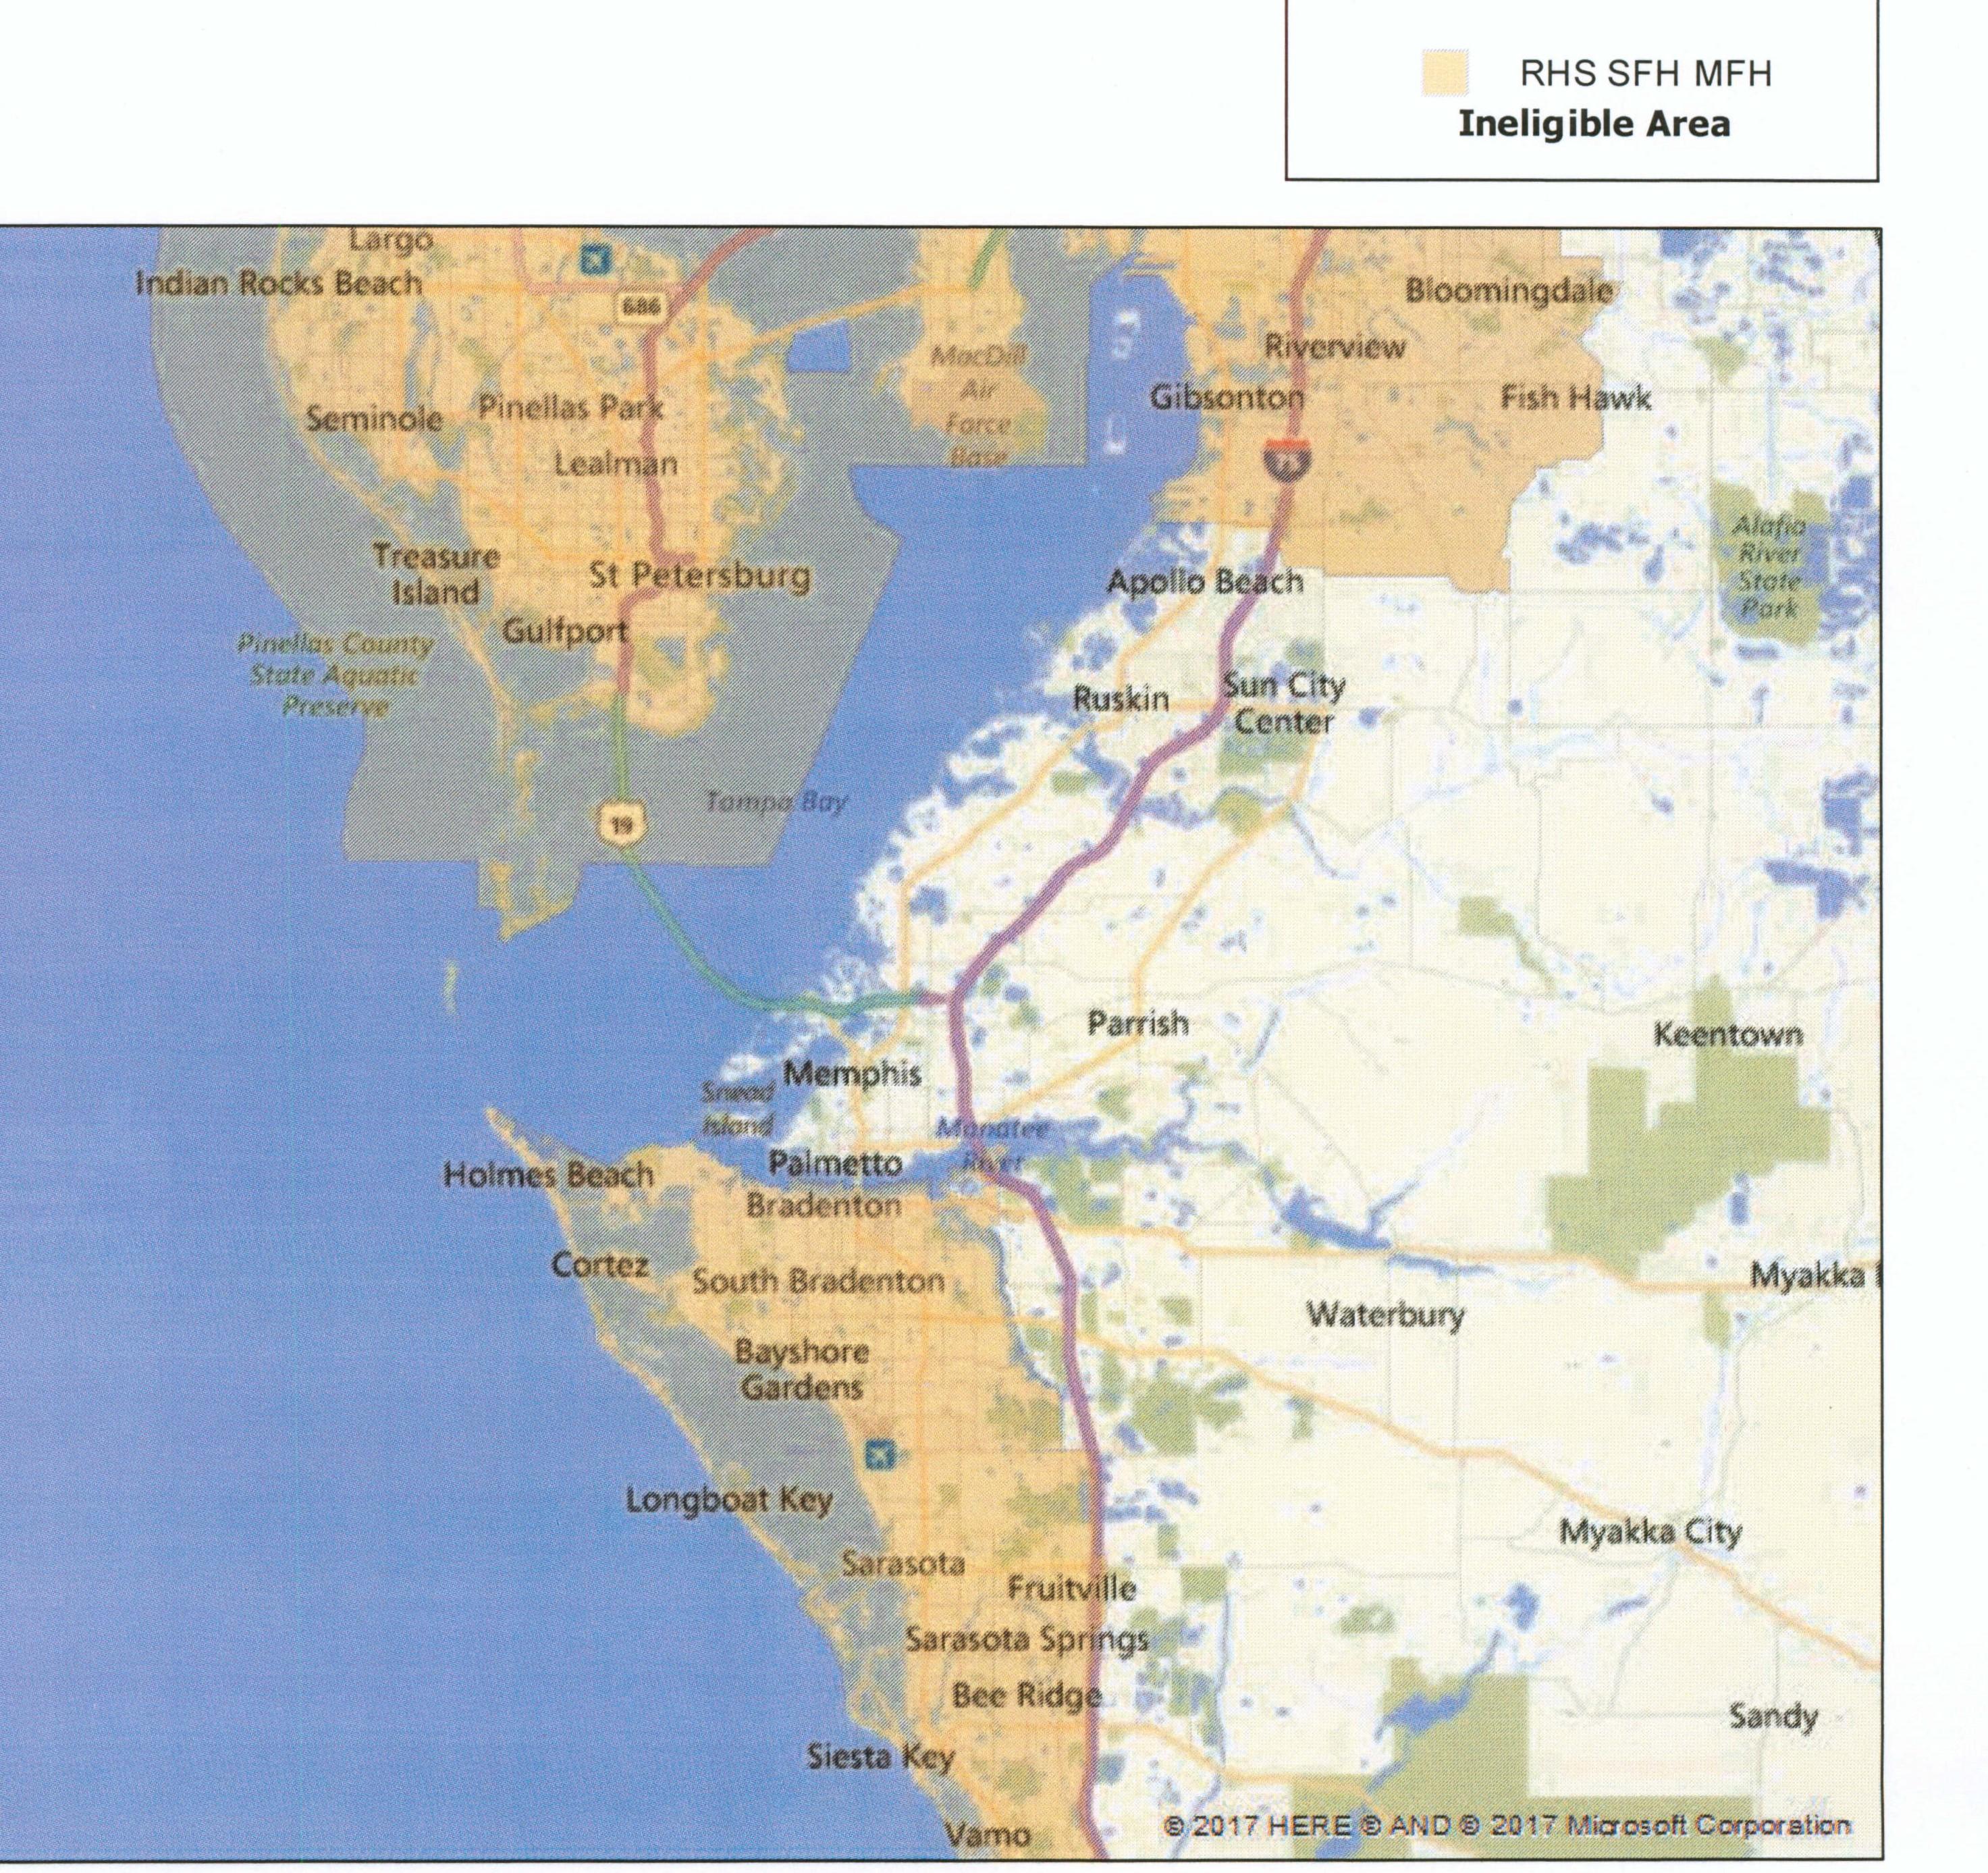 Usda Loan | Multiline Mortgage | (941) 201-9111 | Multiline Mortgage - Usda Home Loans Map Florida